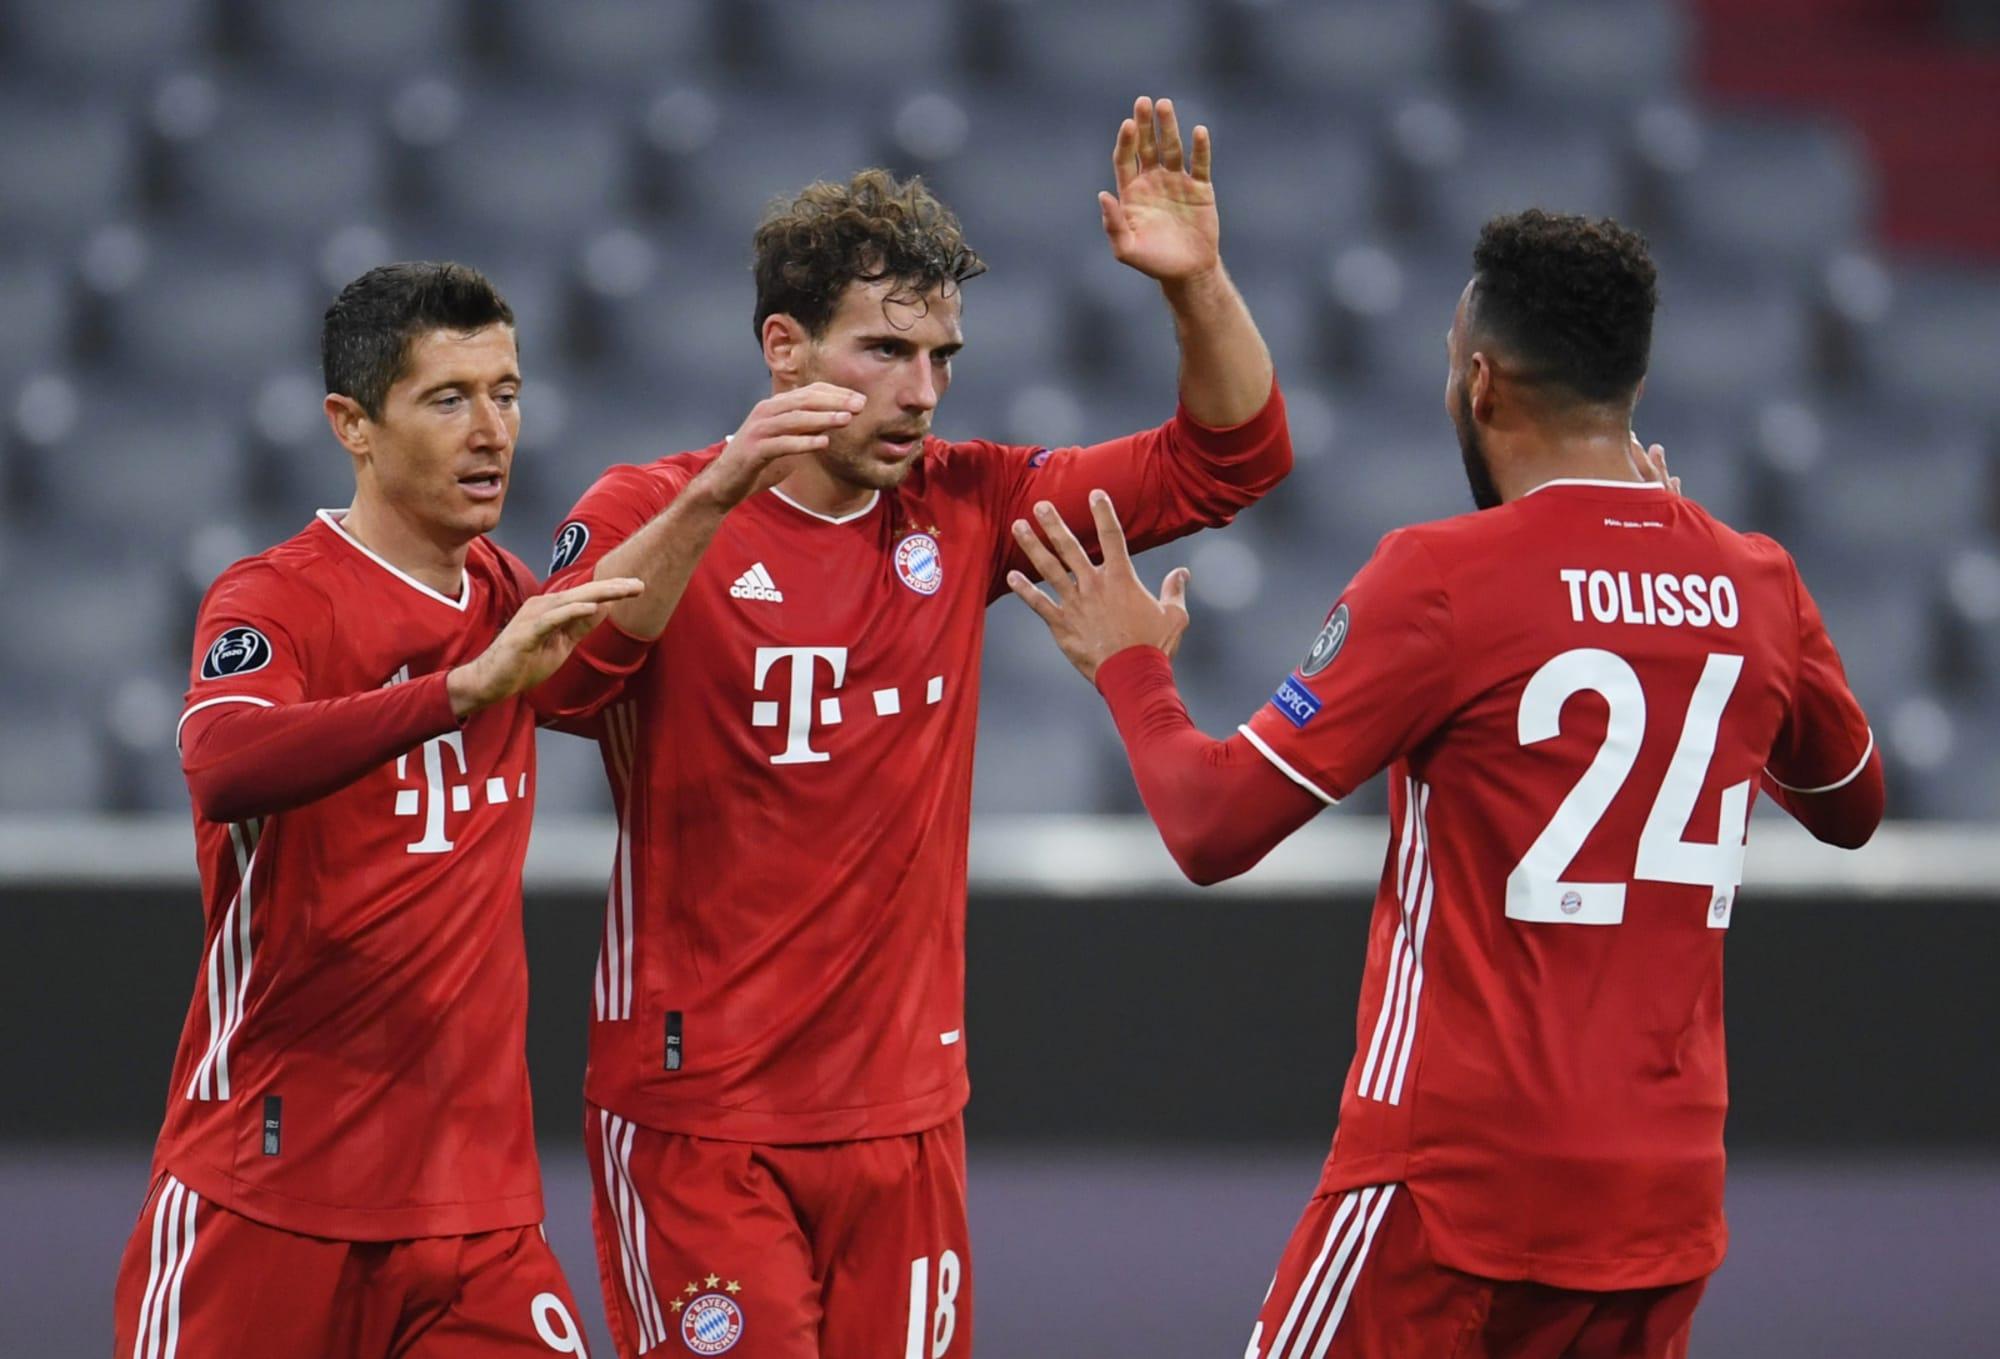 Bayern Munich: Three things to watch for against Eintracht Frankfurt